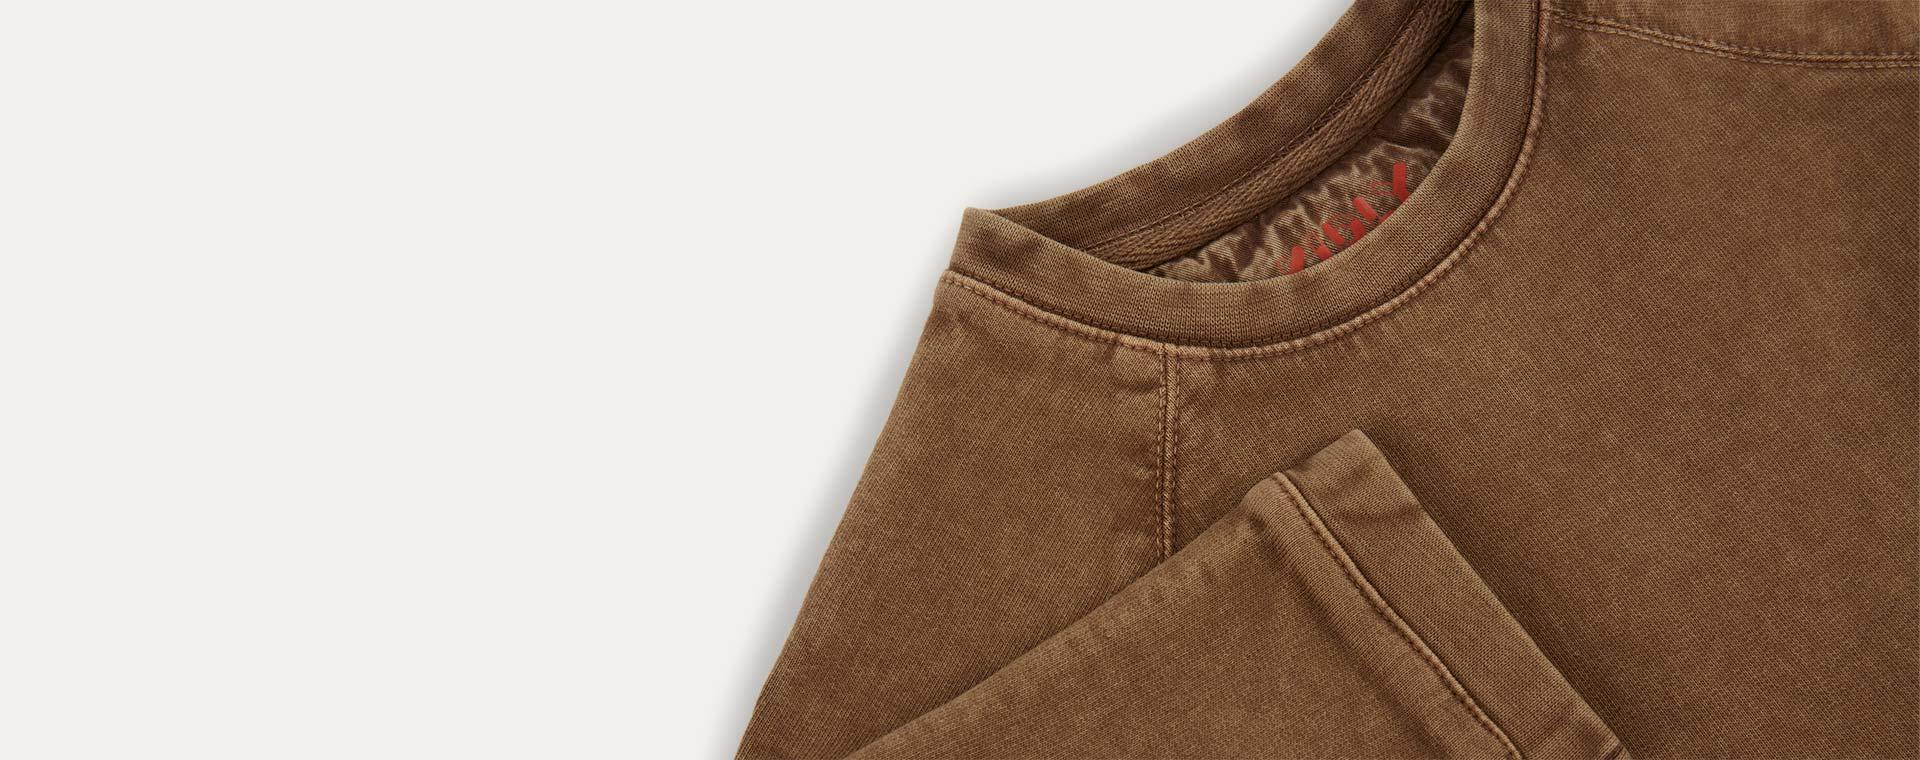 Brown KIDLY Label Dress